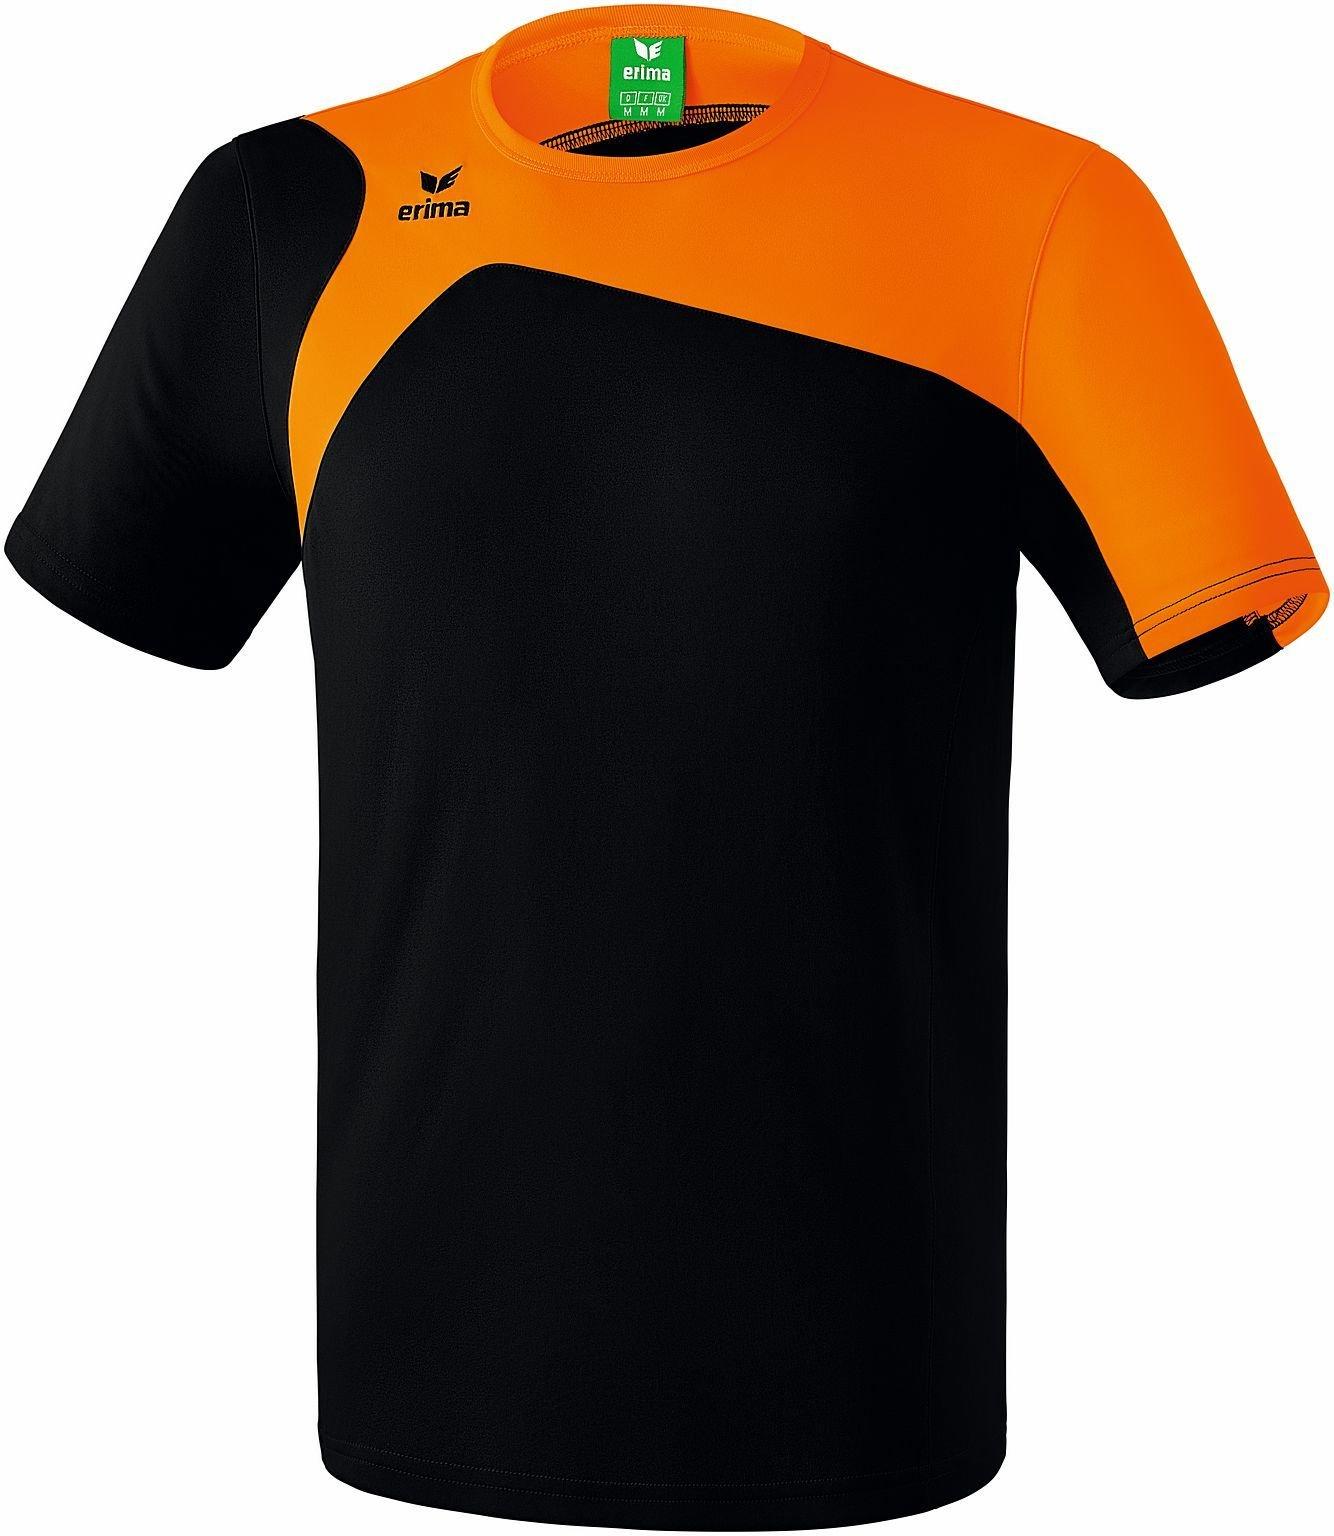 Club 1900 2.0 T-Shirt